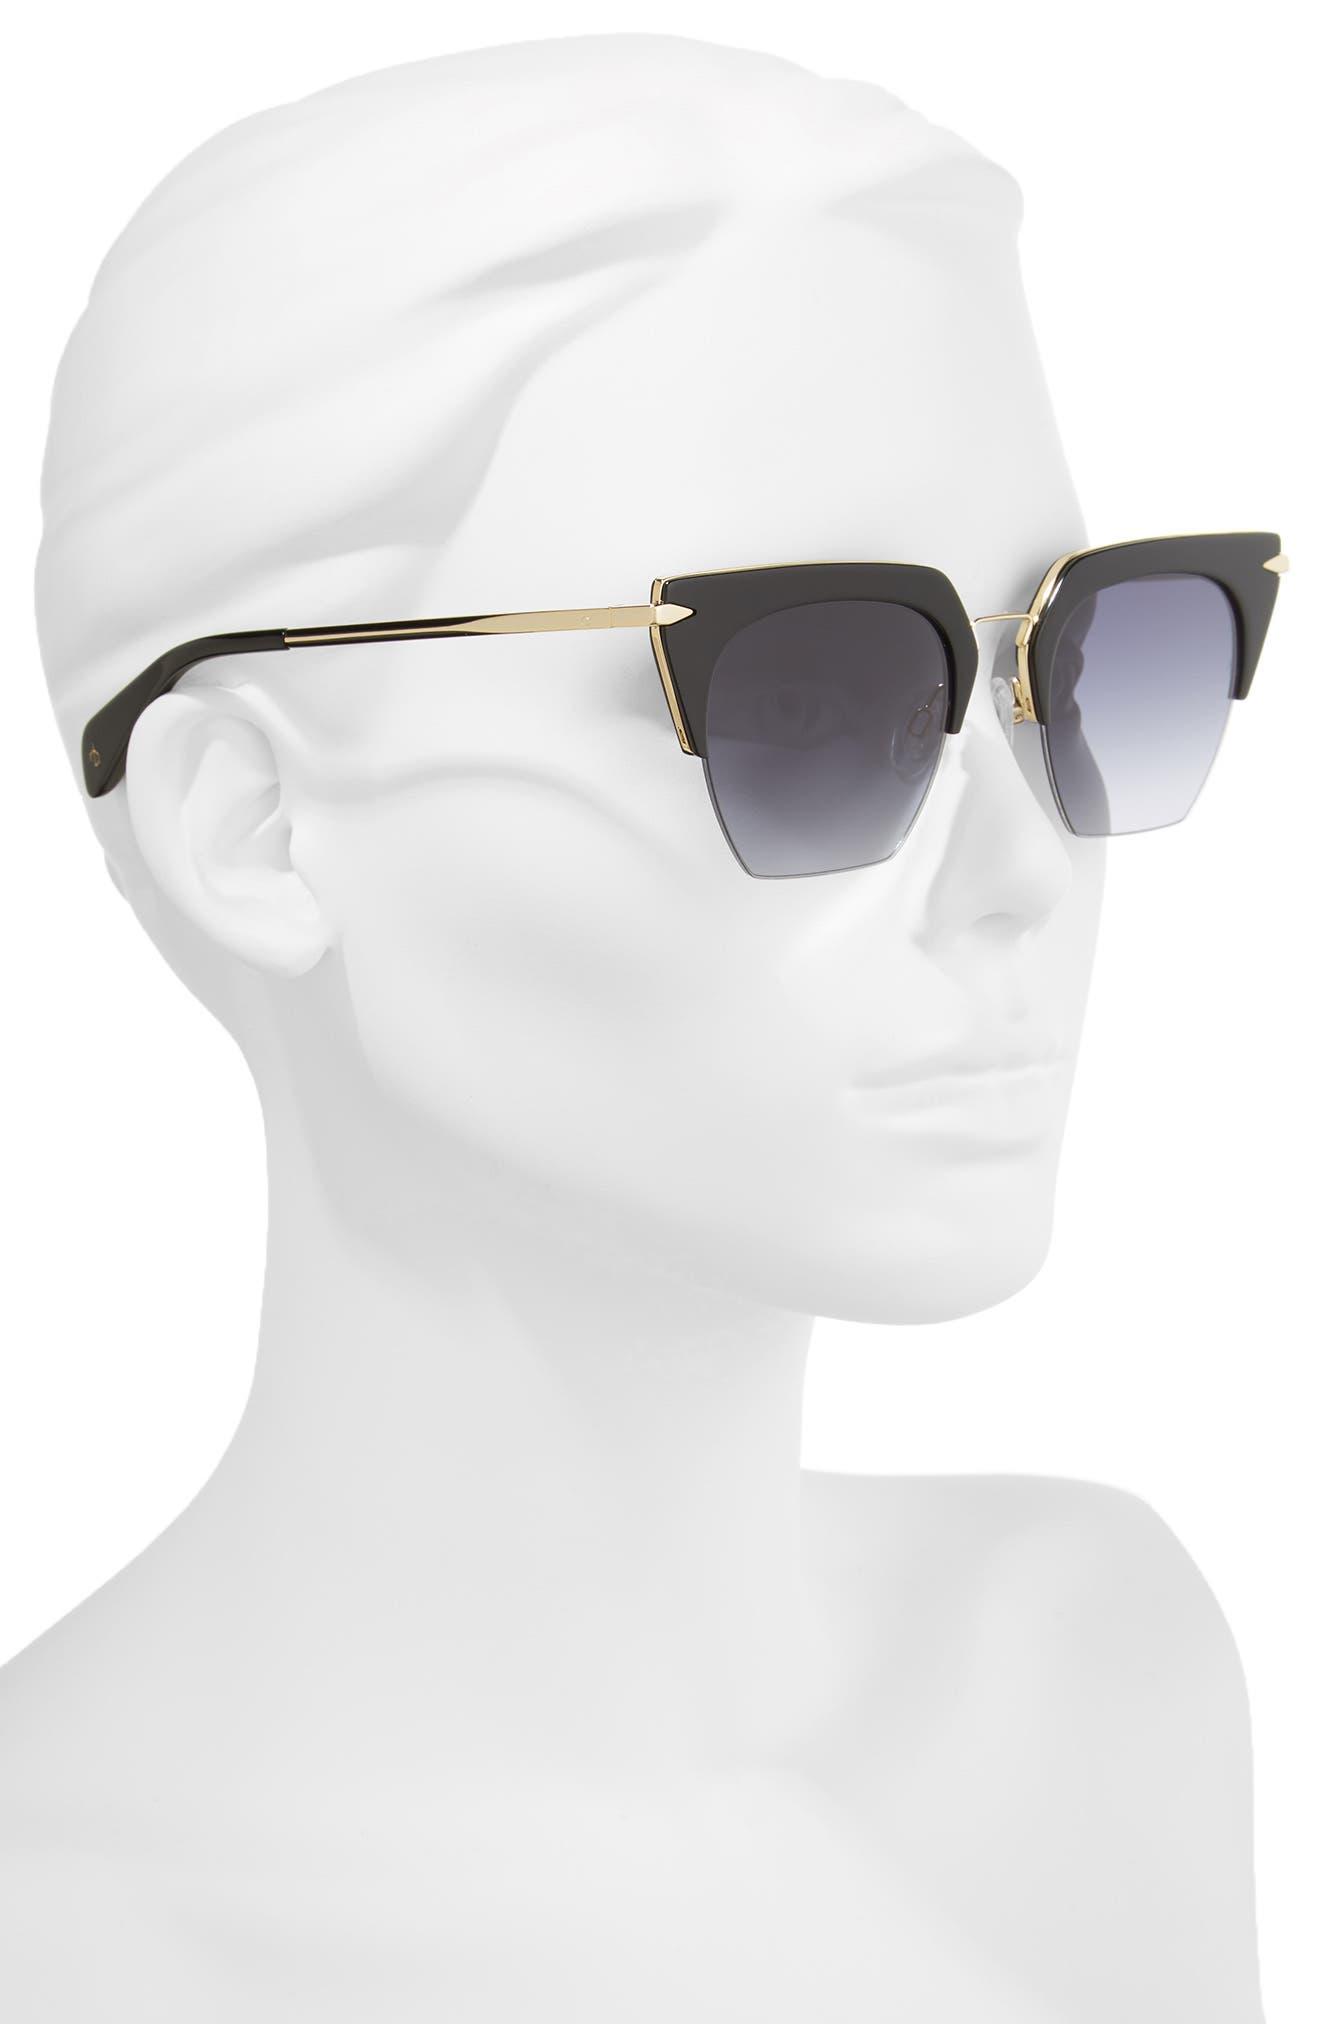 51mm Cat Eye Sunglasses,                             Alternate thumbnail 2, color,                             BLACK/ GOLD